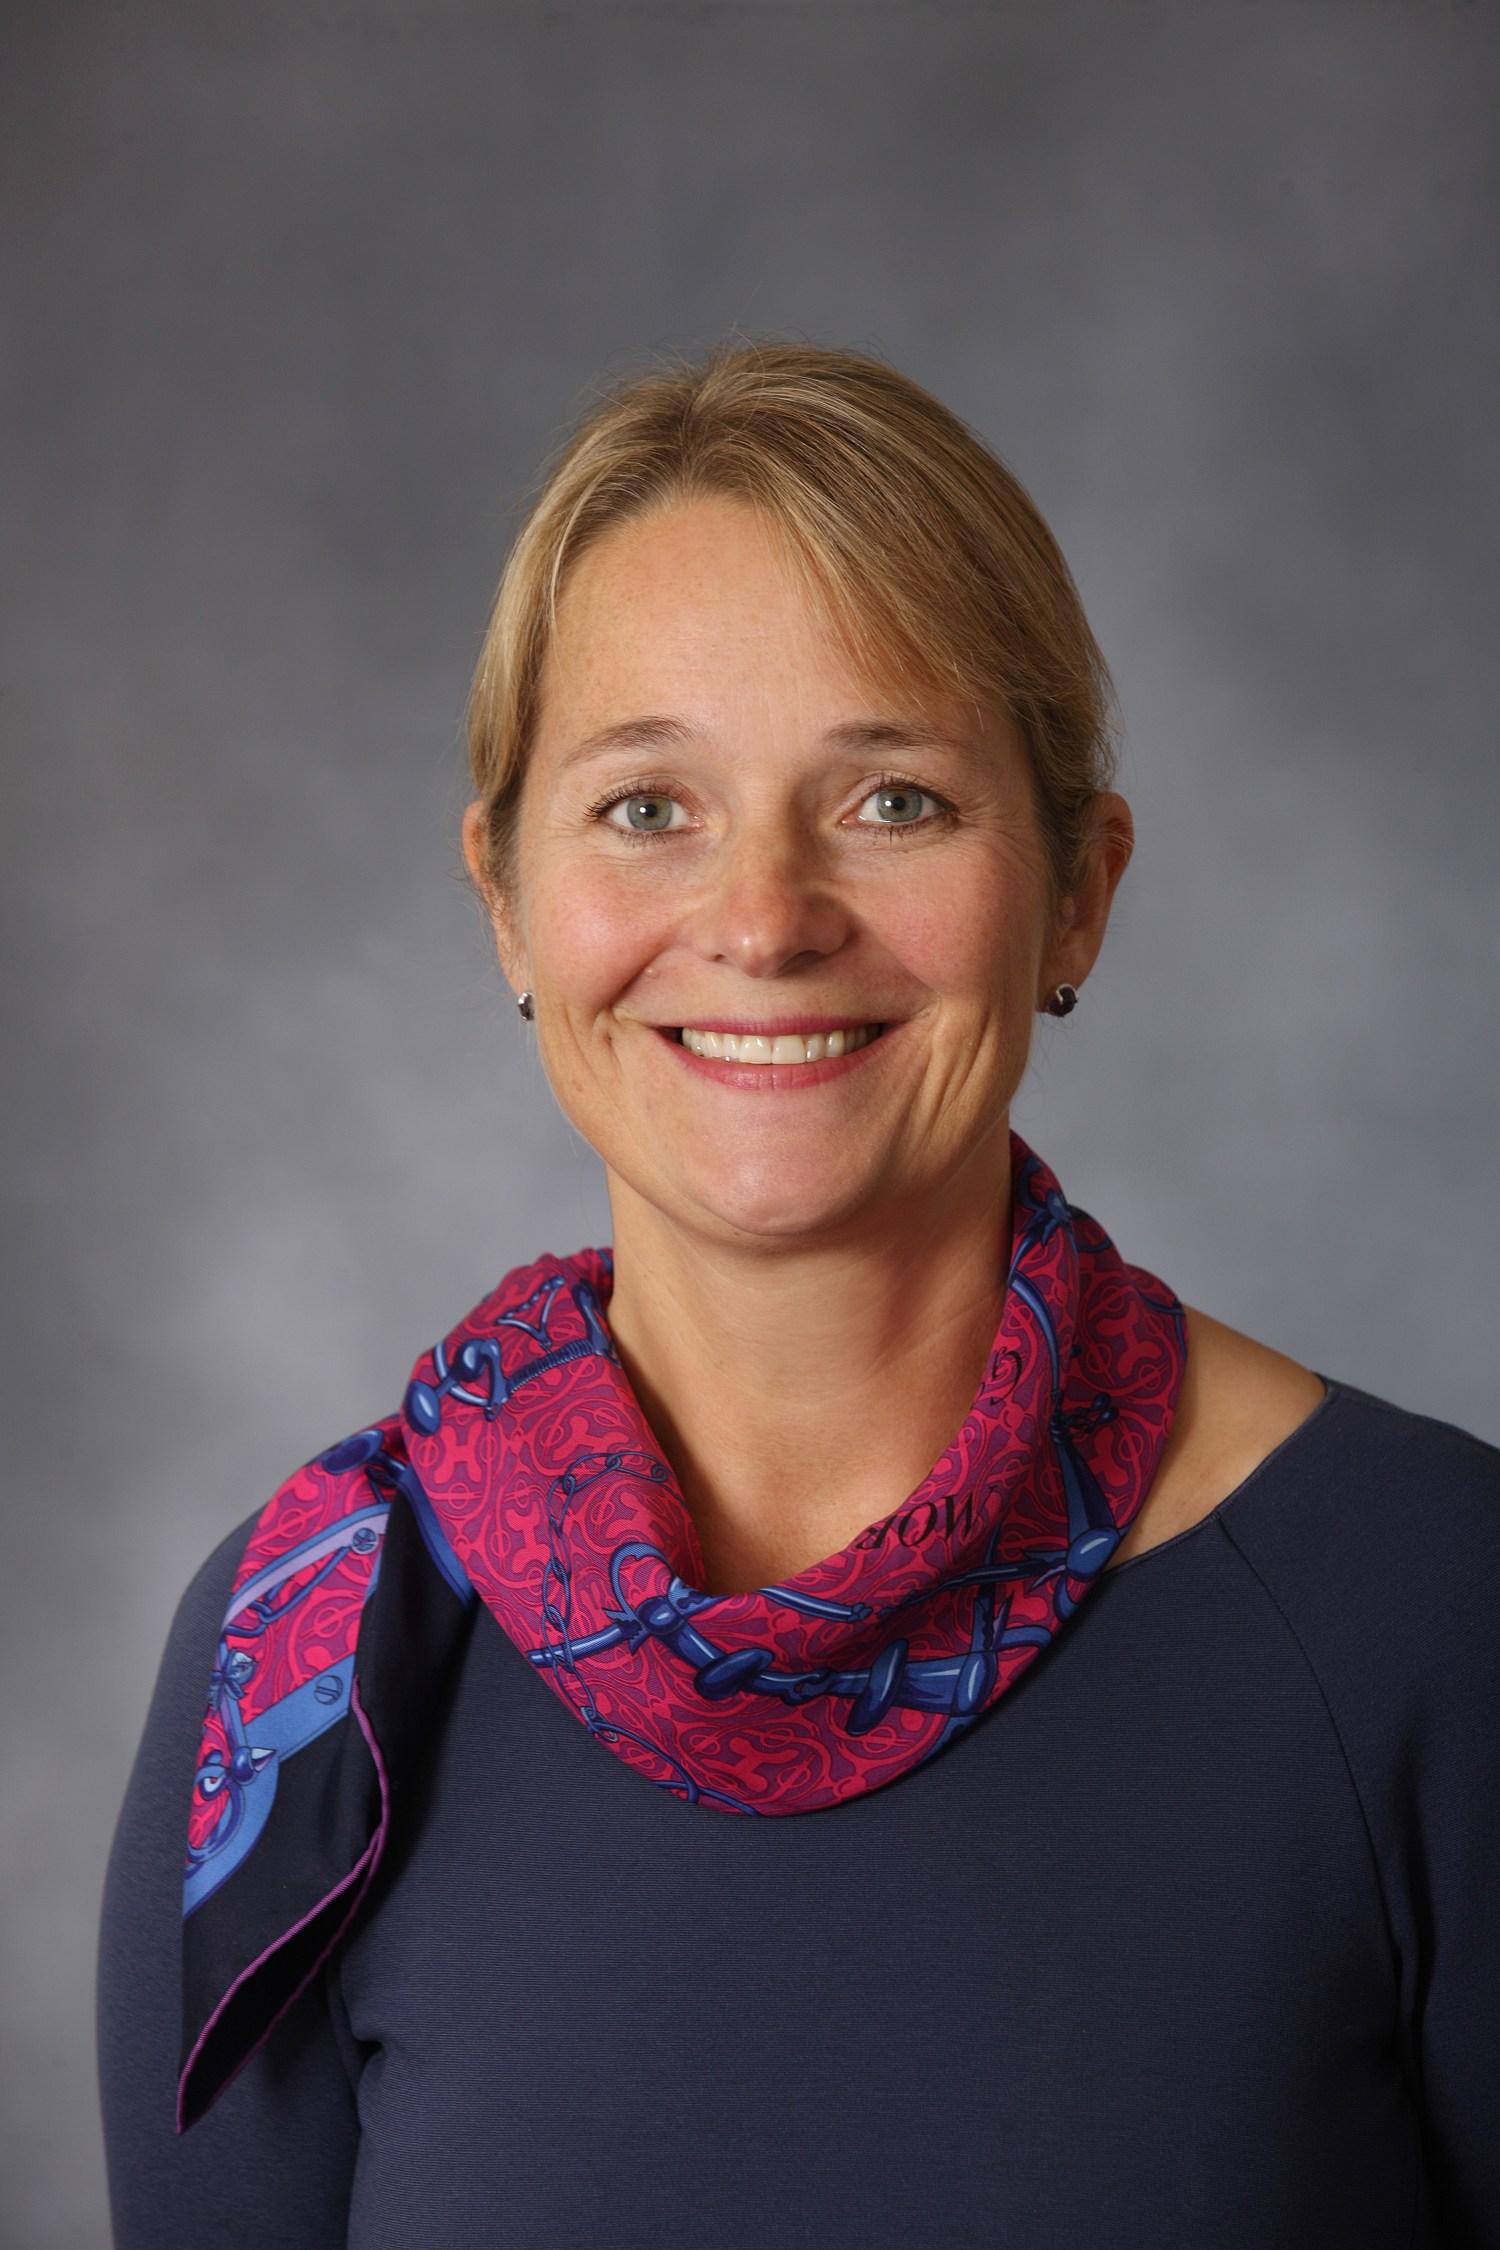 Naomi Climer, IET President